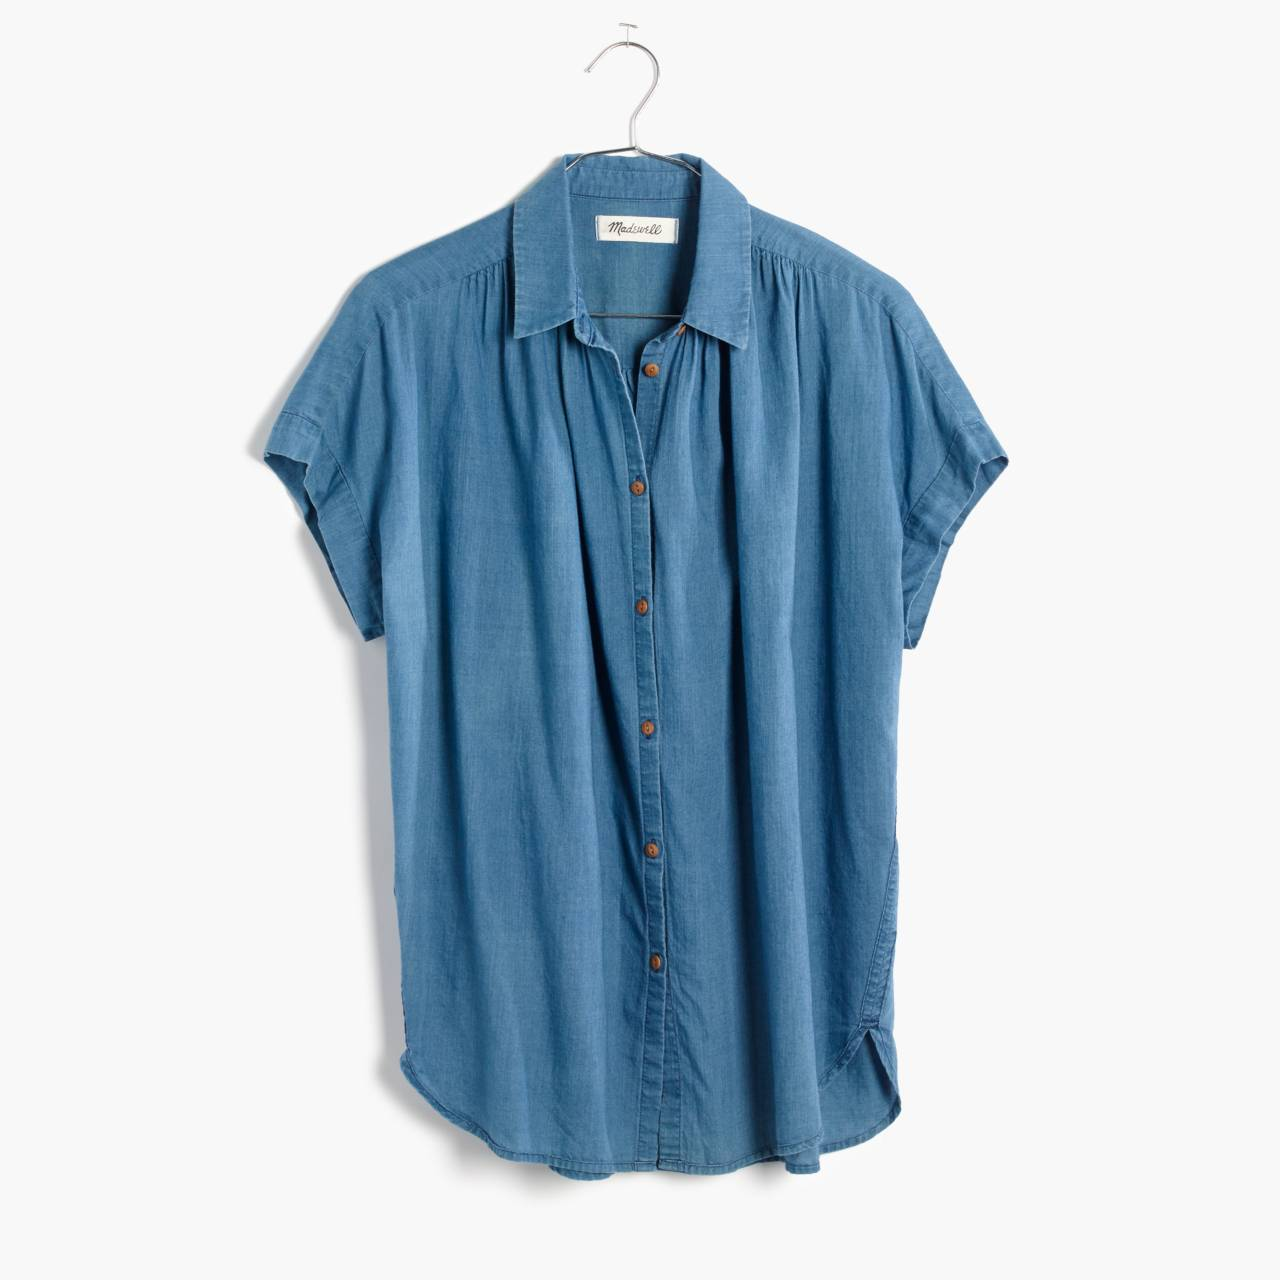 Central Shirt in Bright Indigo in bright indigo image 4